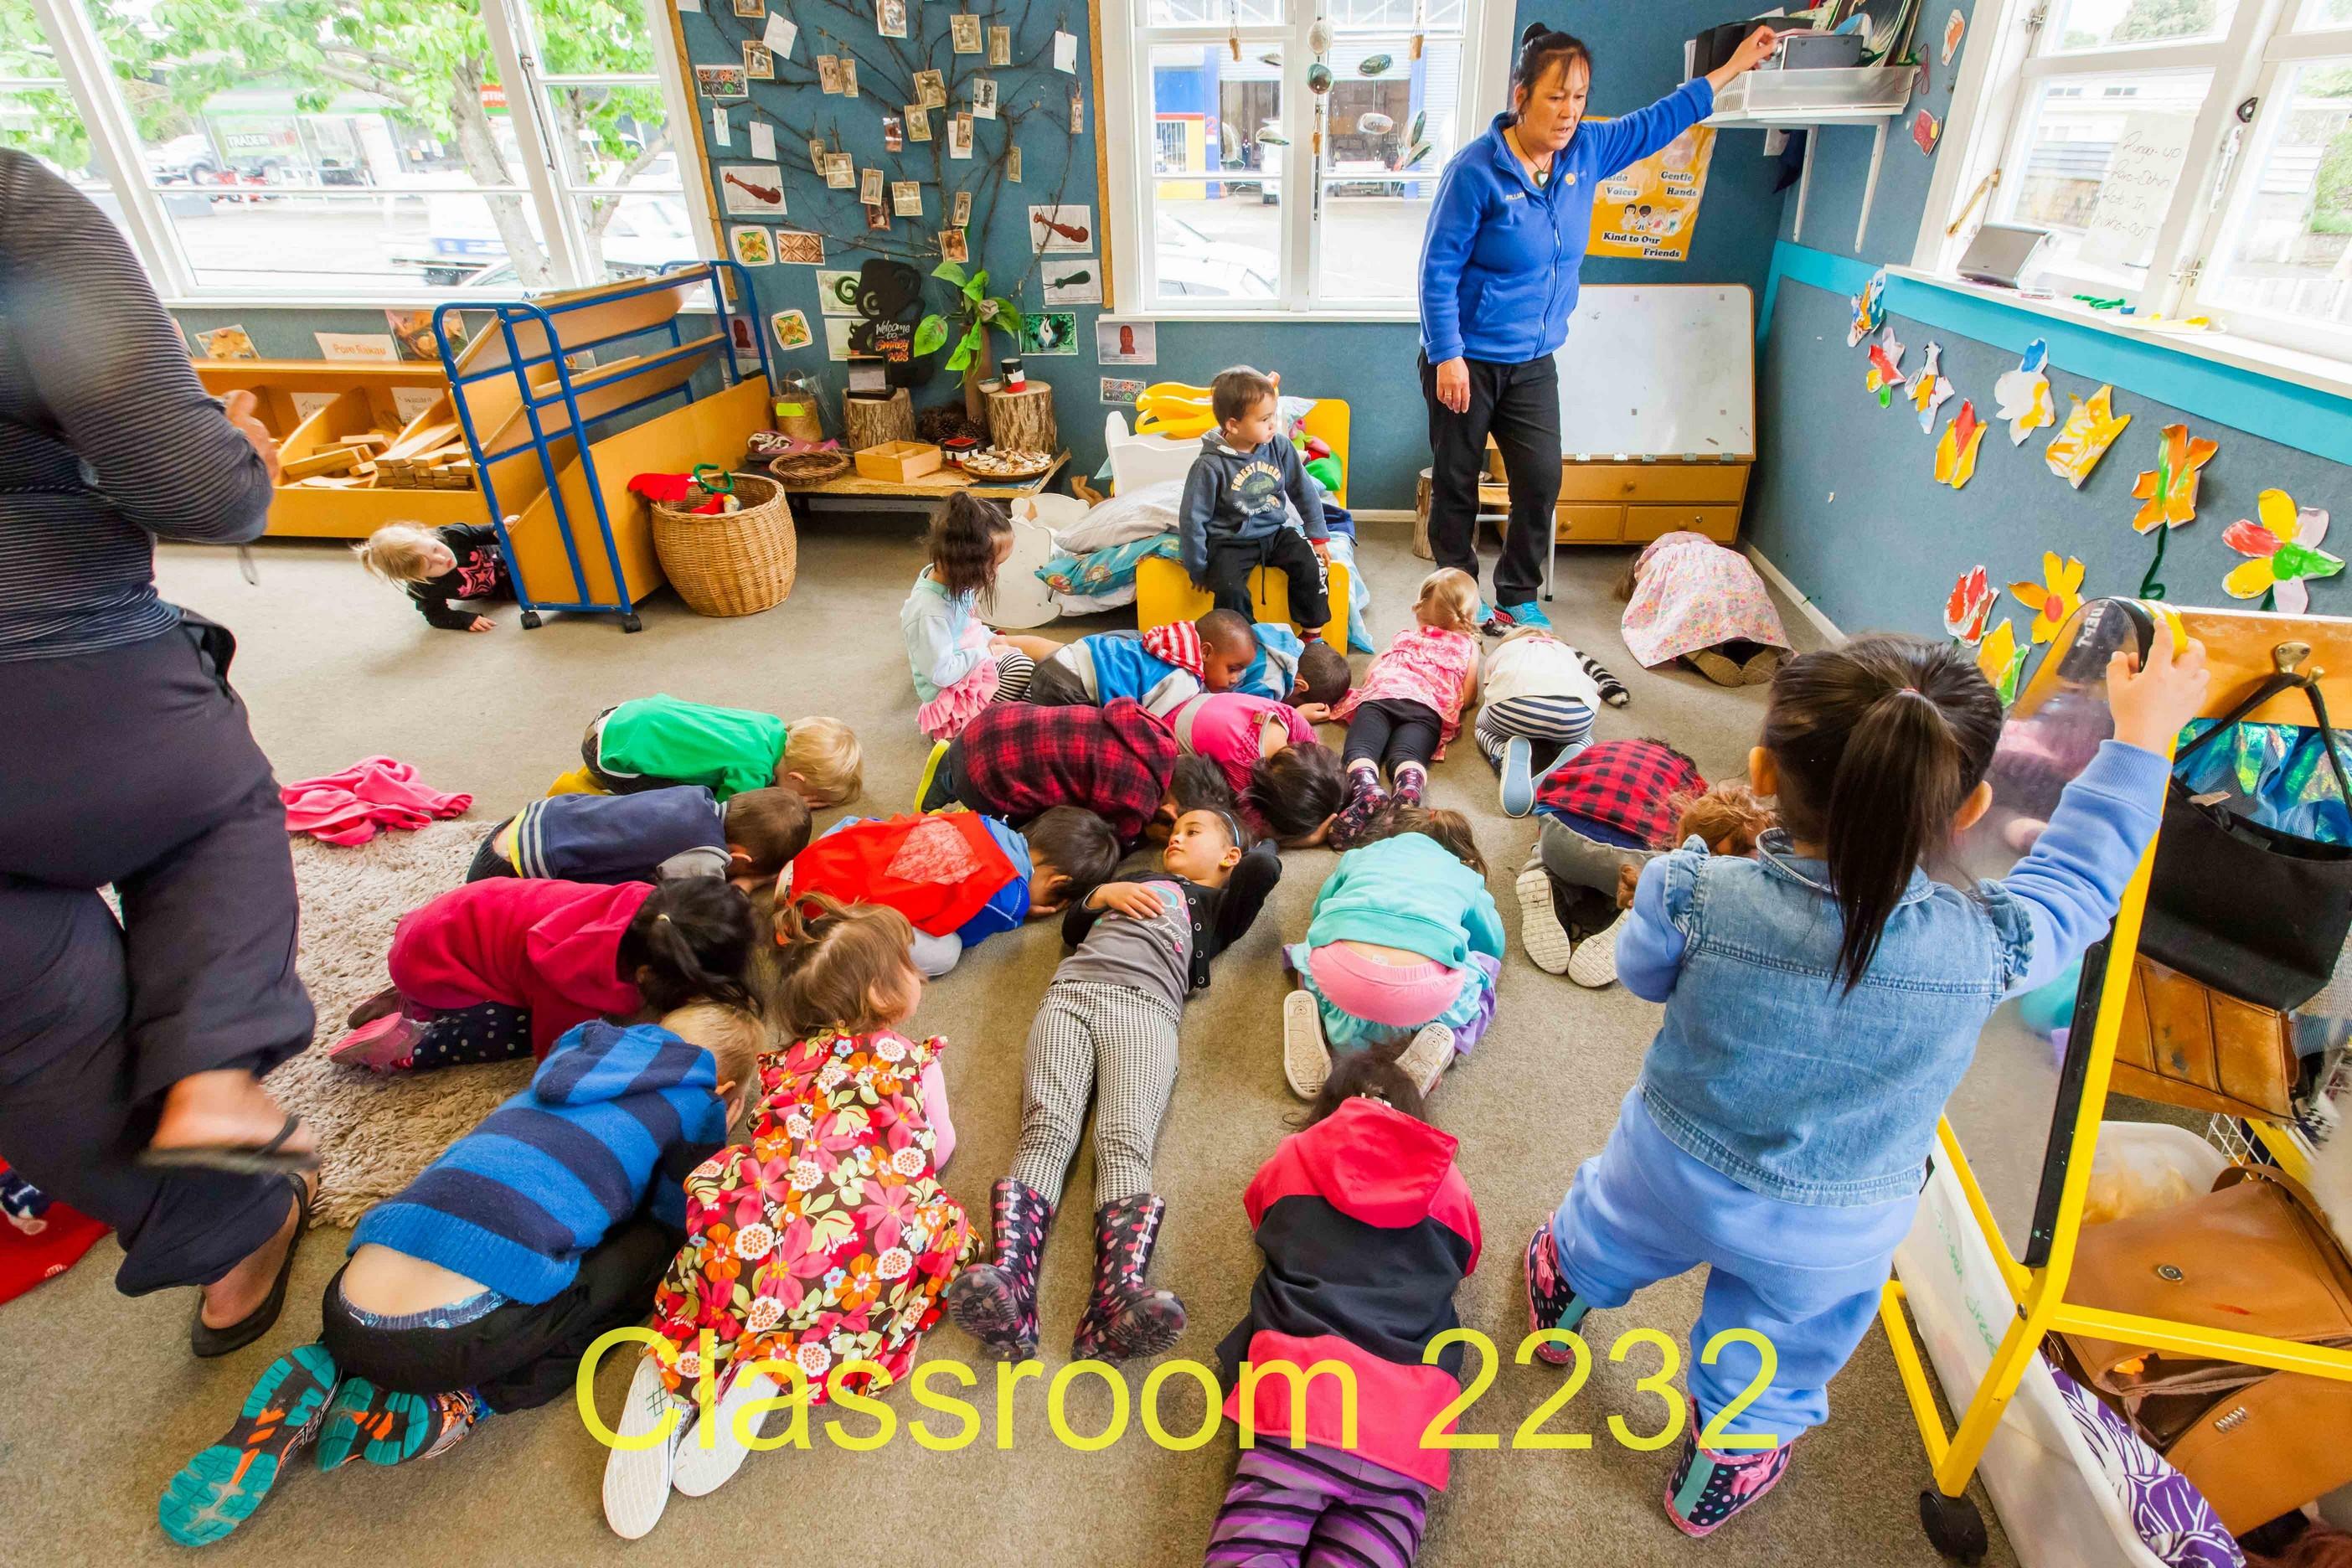 Classroom 2232